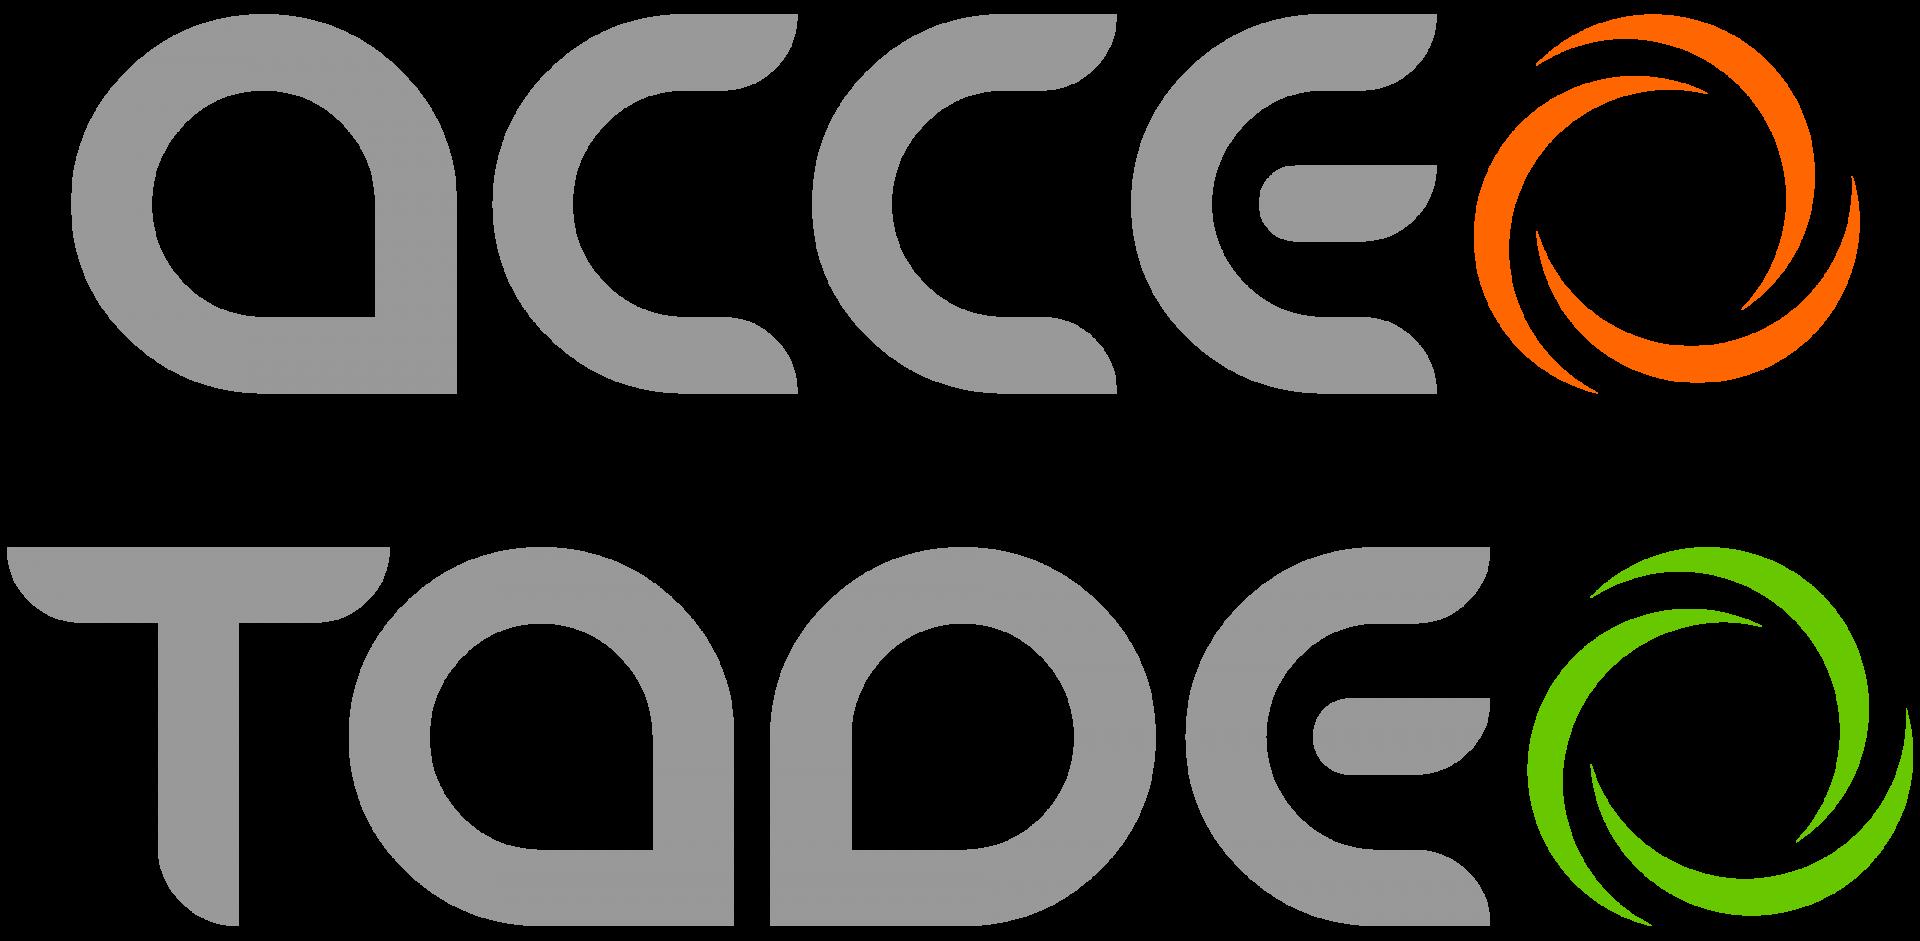 Tadeo acceo 1